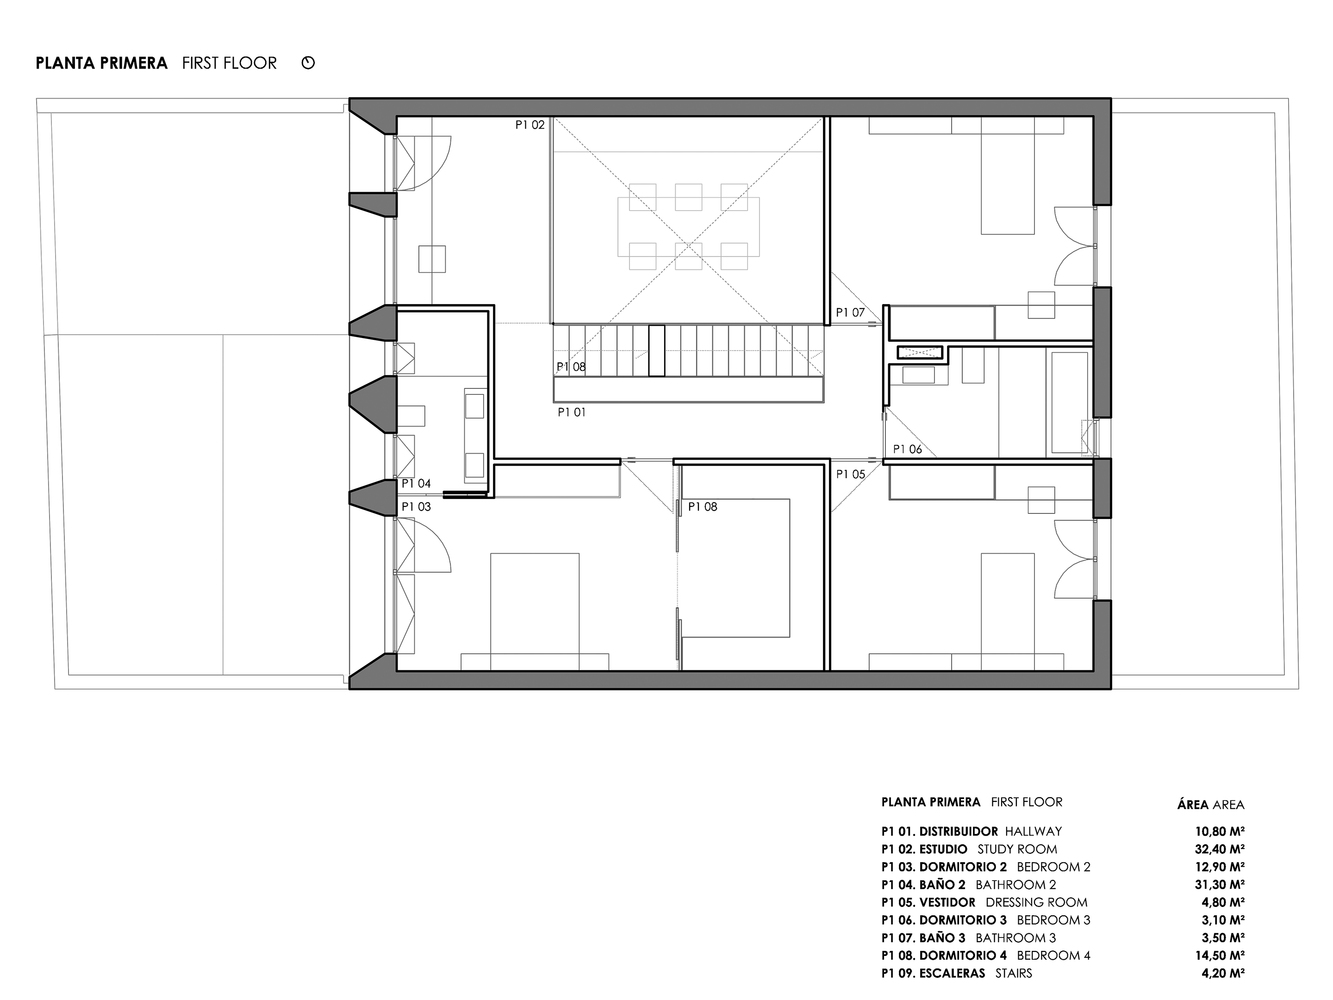 Mặt bằng biệt thự 300m2 - Brise Soleil House 5